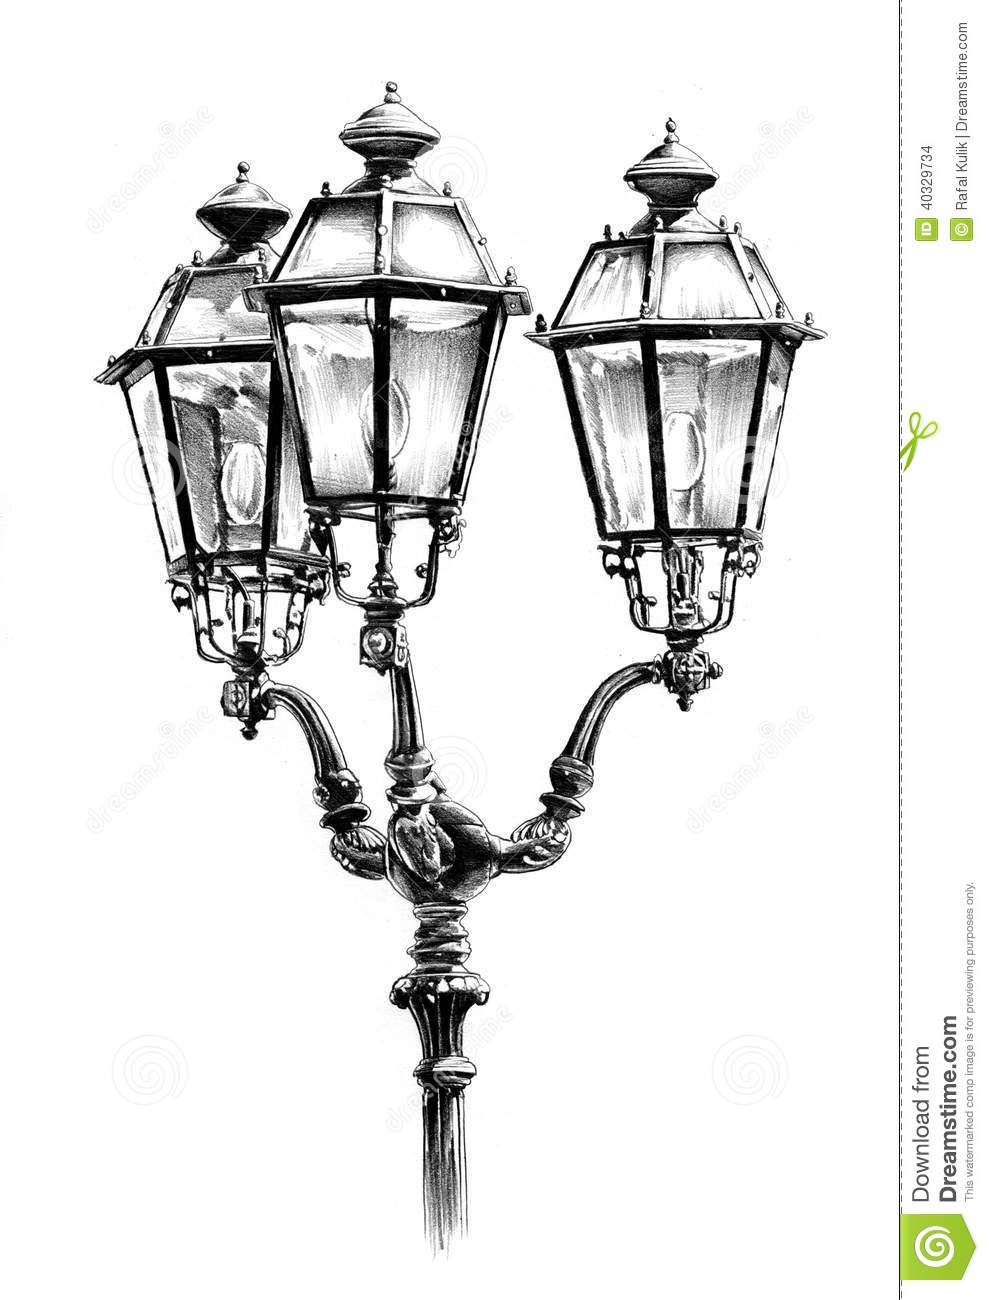 Pin By Kendall Rump On Art Street Lamp Pencil Drawings Lantern Drawing